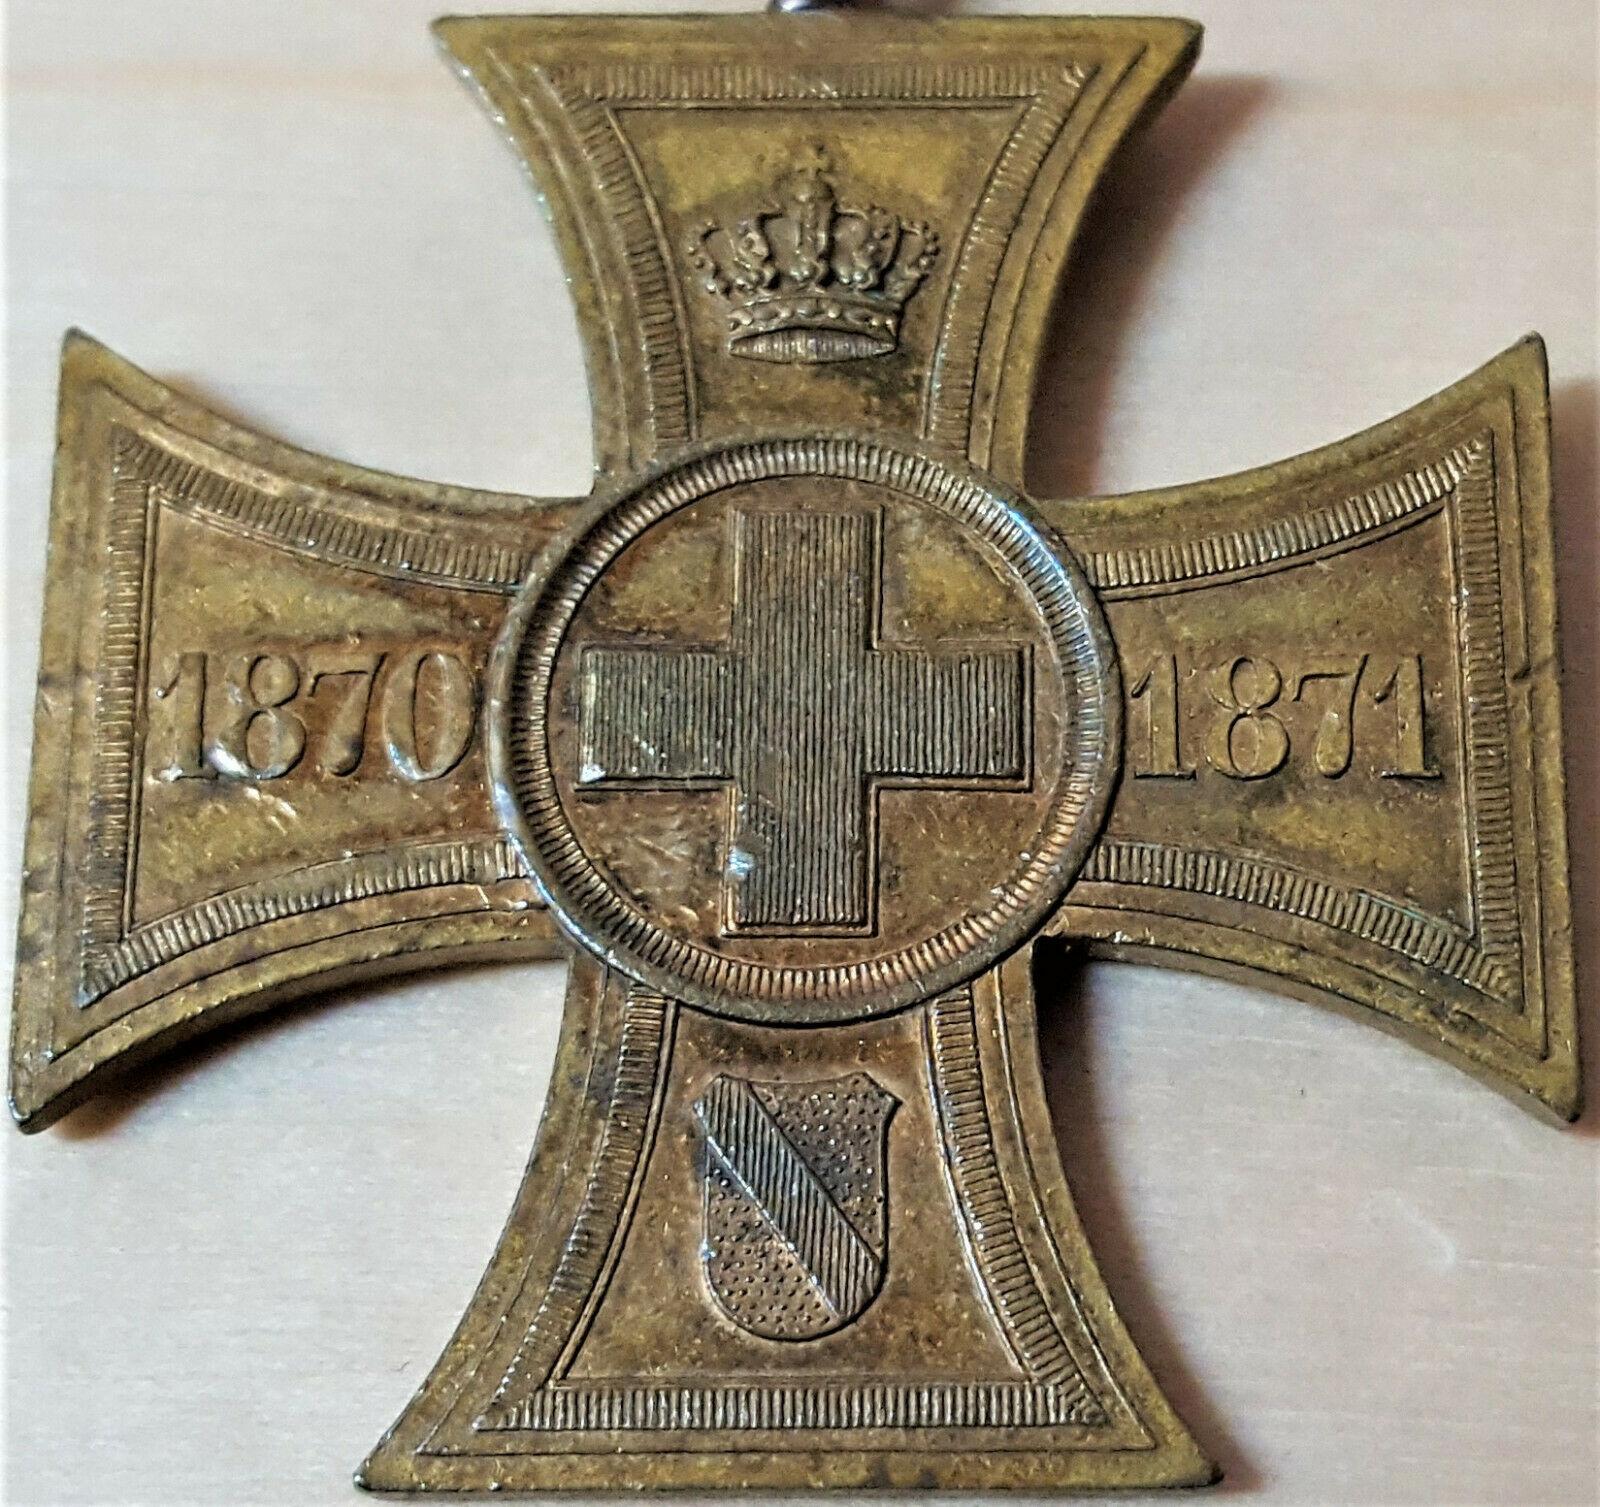 PRE WW1 GERMANY KINGDOM OF BADEN WAR HELPER VOLUNTARY RELIEF WORK CROSS MEDAL